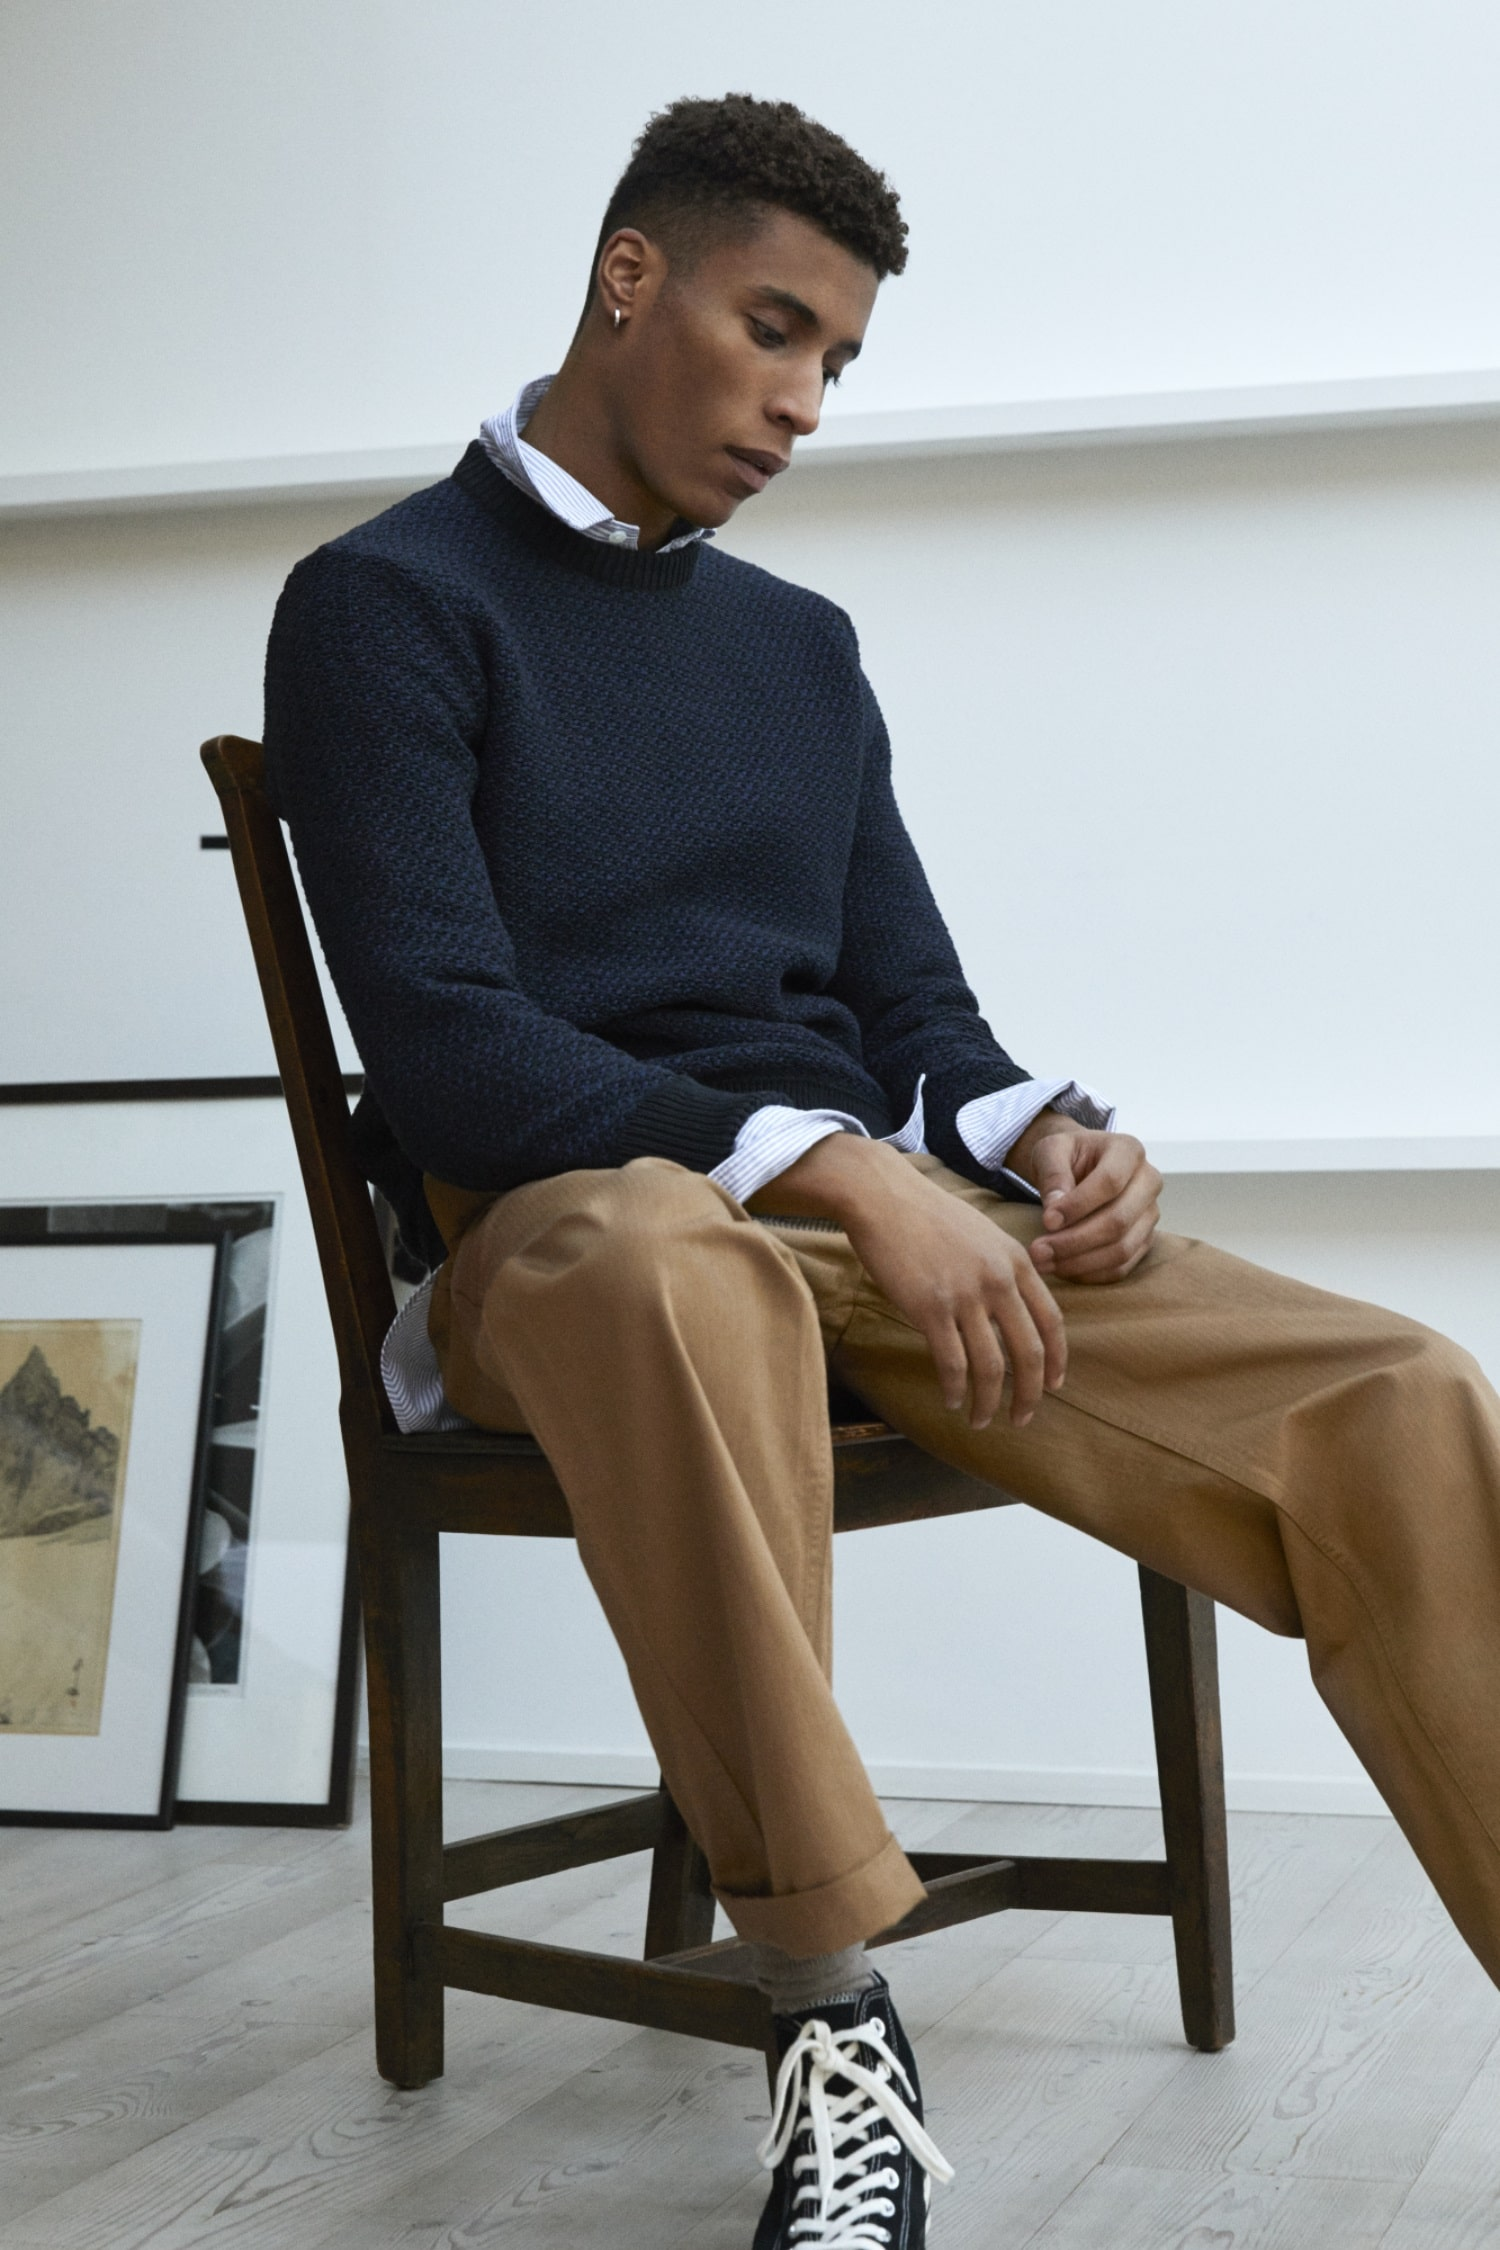 olie arnold mr p black sweater